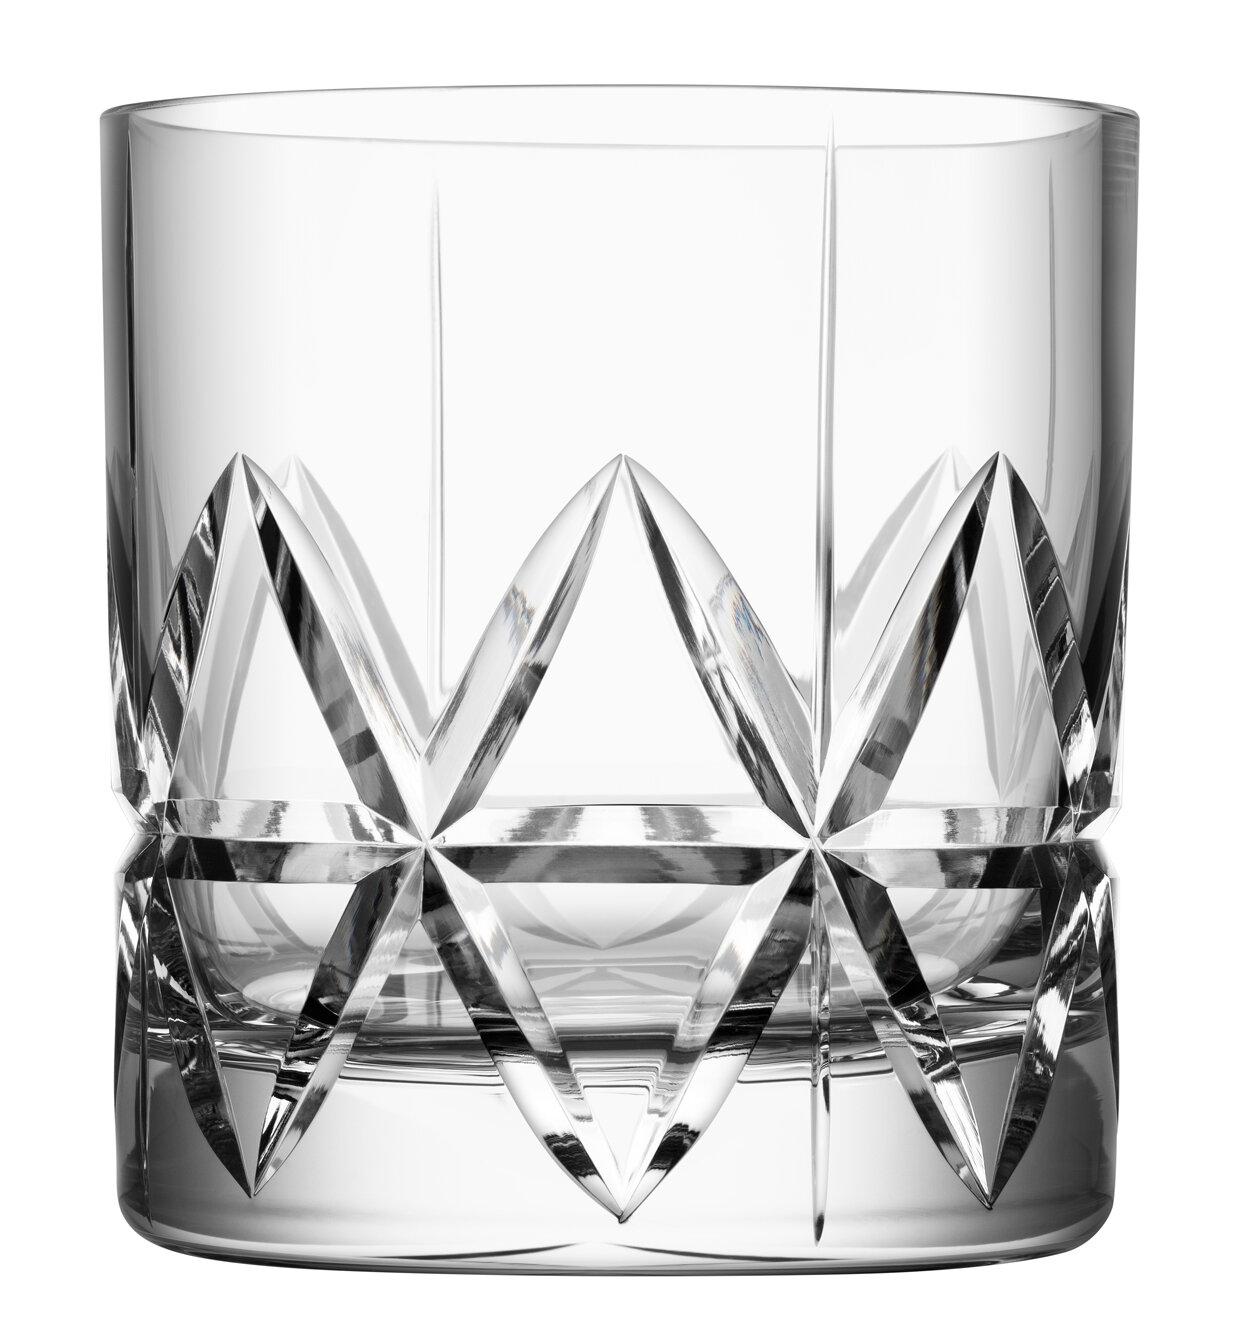 4 Whisky Glass Set Stylish Sturdy Glasses Unique 12 Oz Whiskey Crystal Glasses Glassware Drinkware Martini Glasses